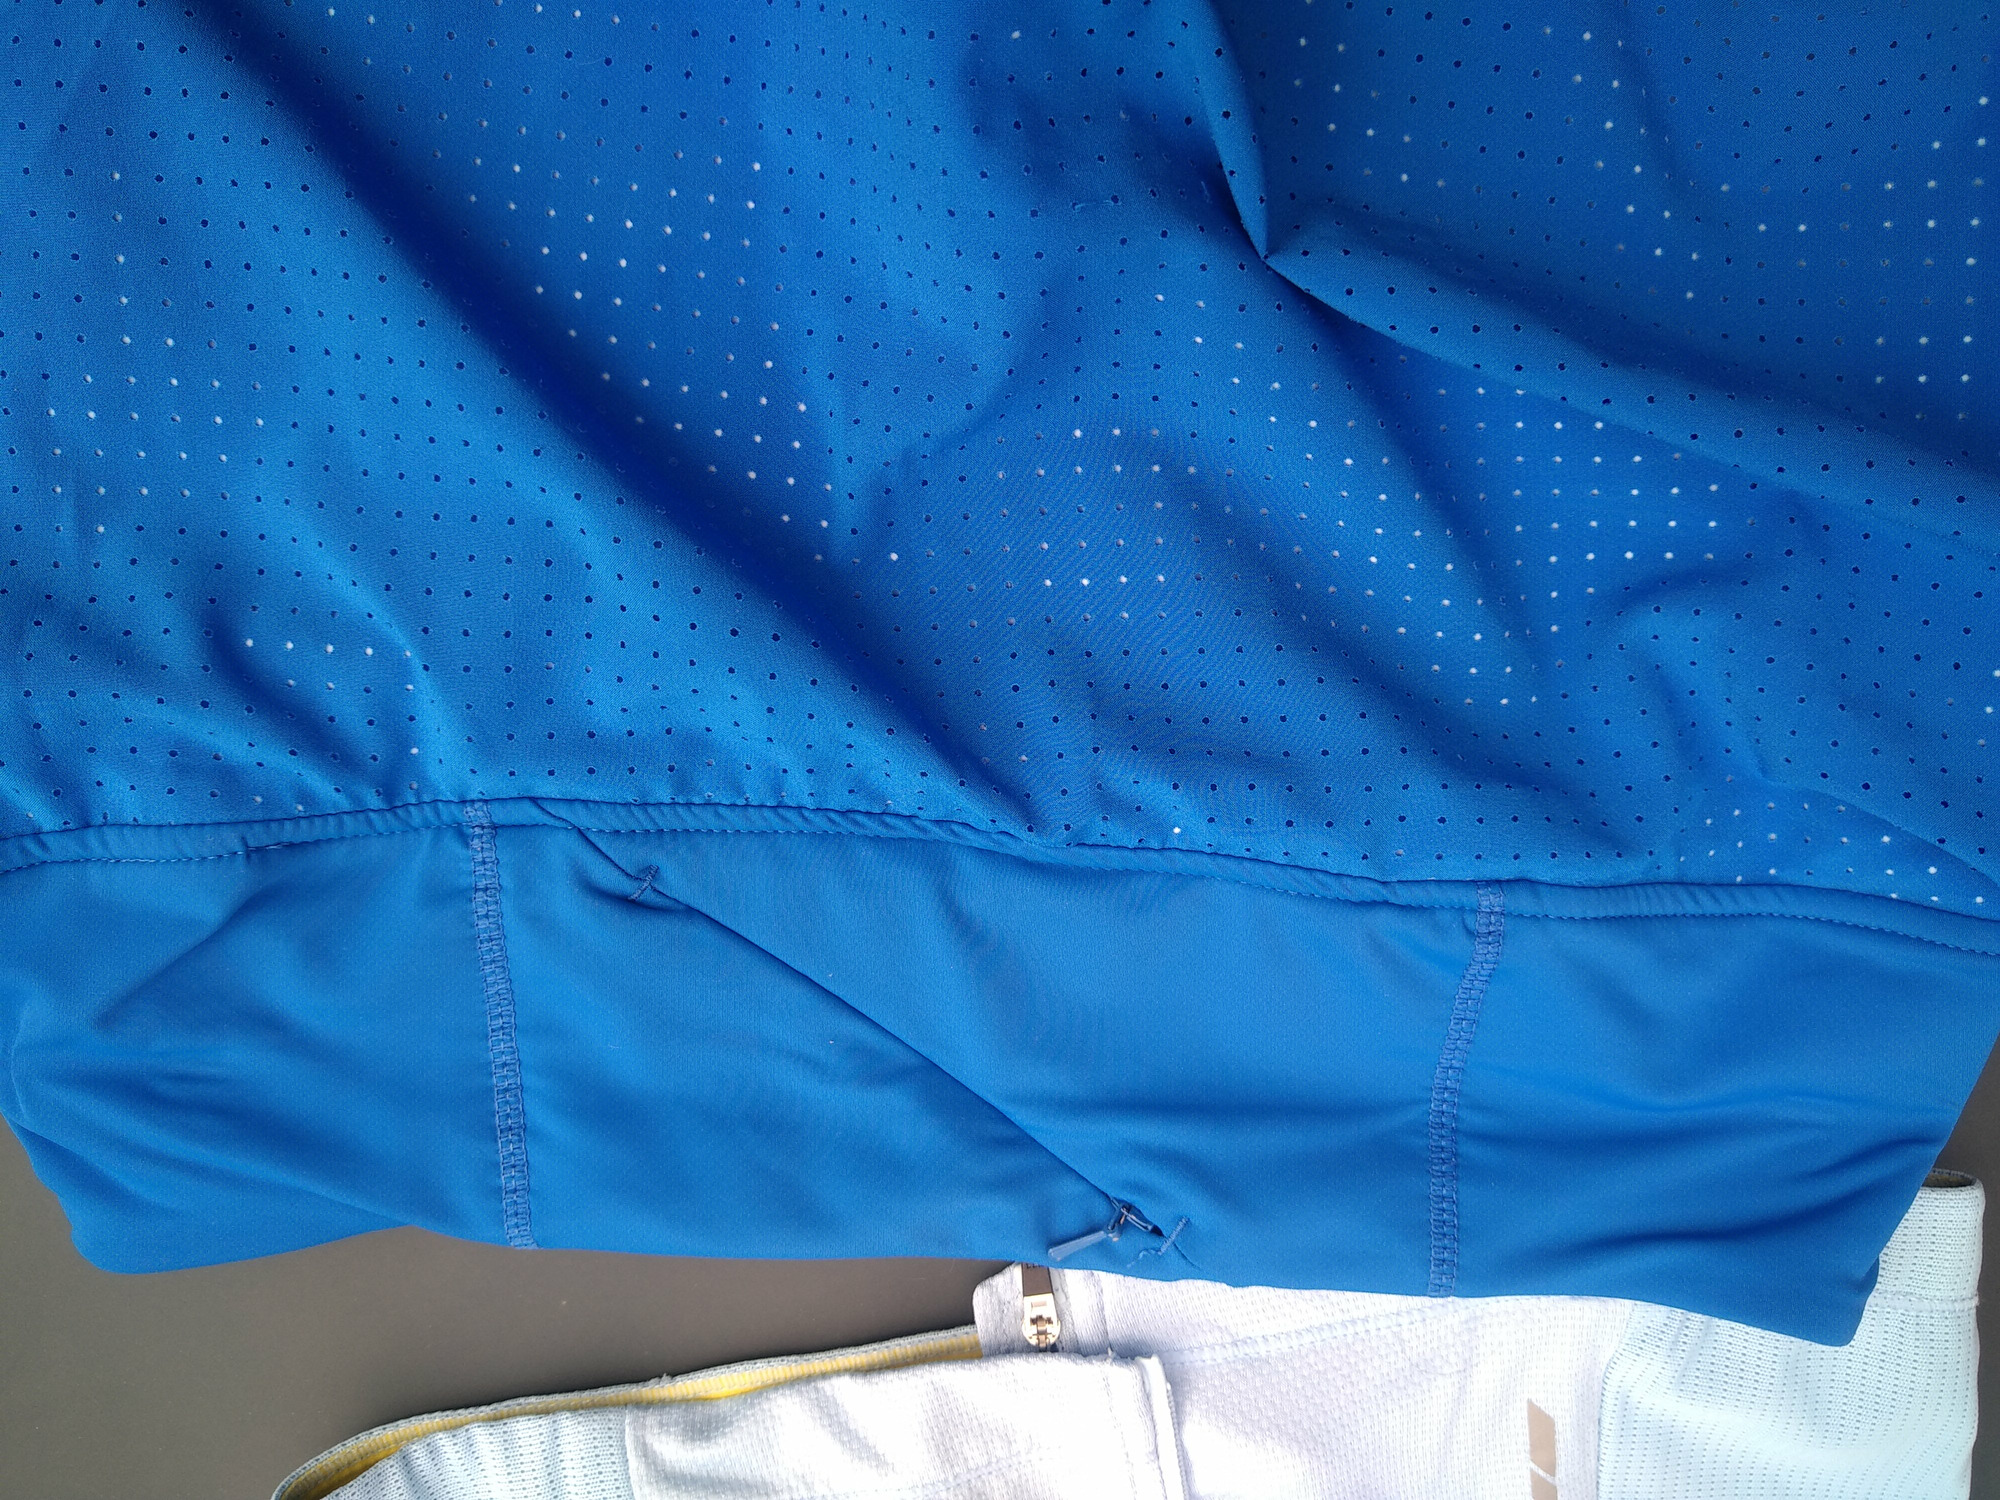 WAA Ultra Ultra skirt 3.0